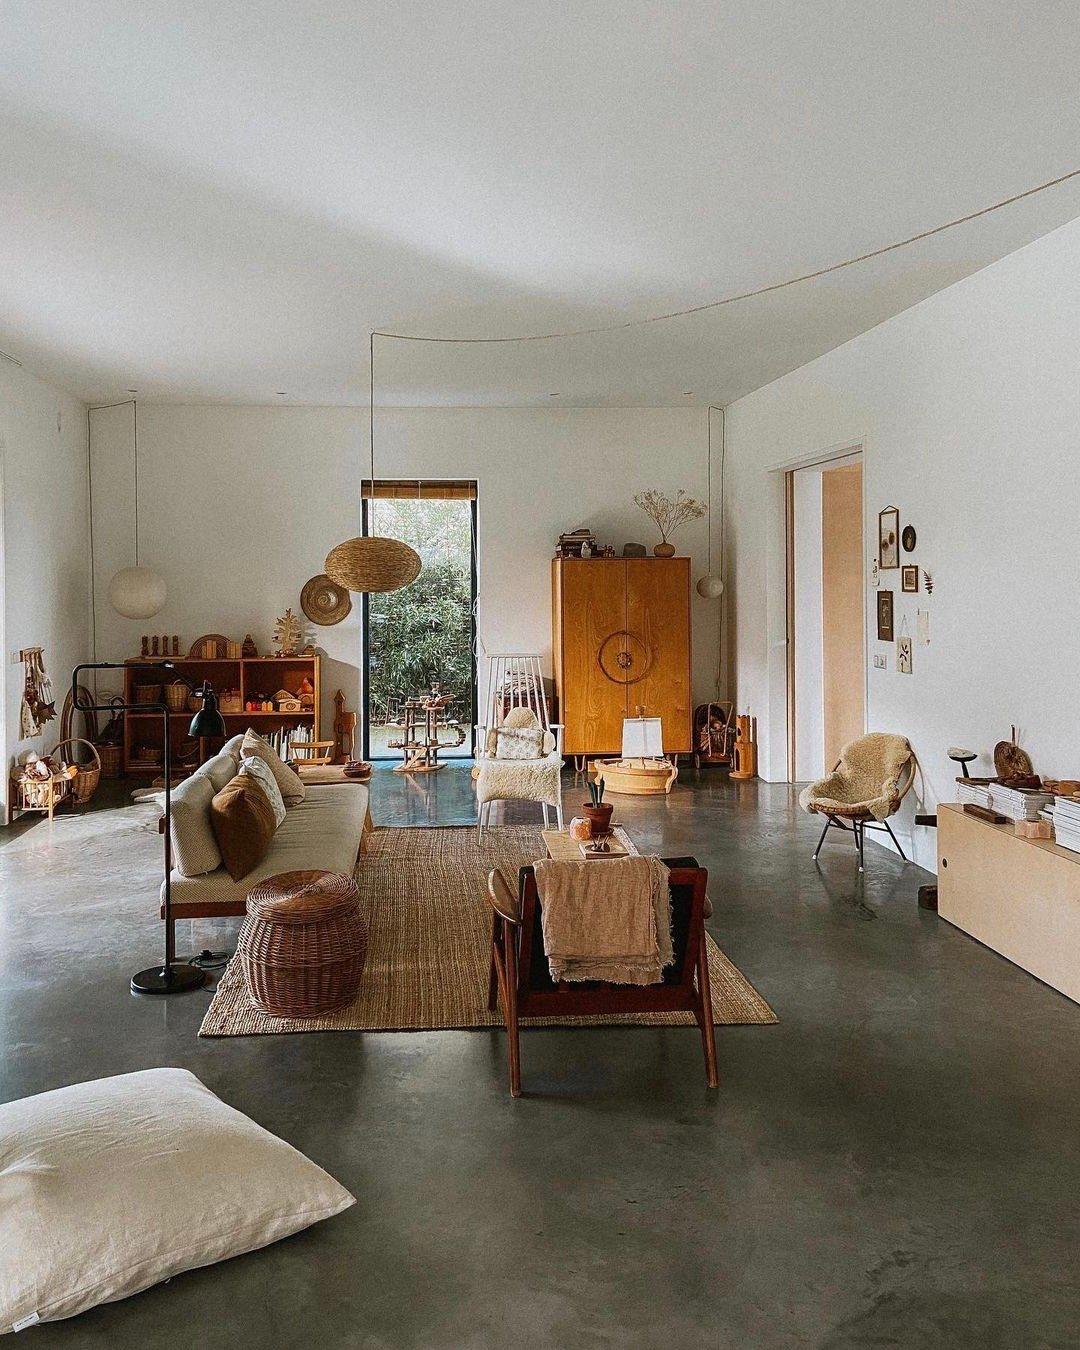 salon bohème wabi sabi vintage rotin minimaliste - blog décoration - clem aroundthecorner